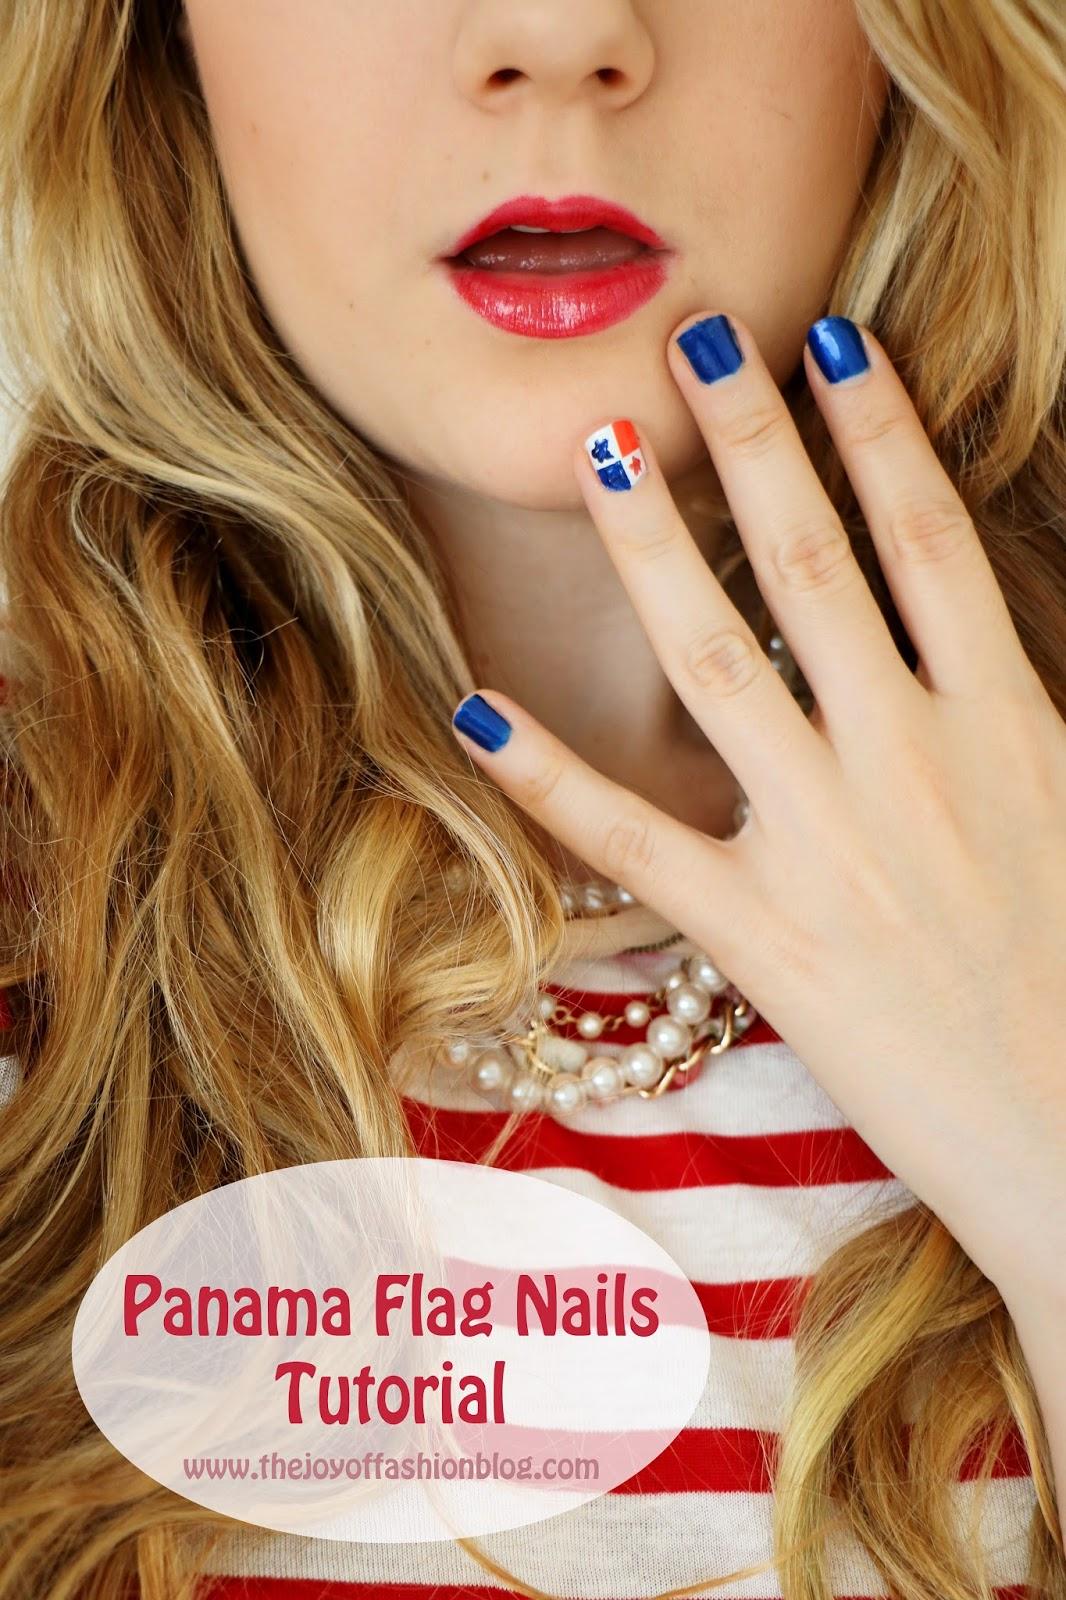 Loving these super cute flag nails!